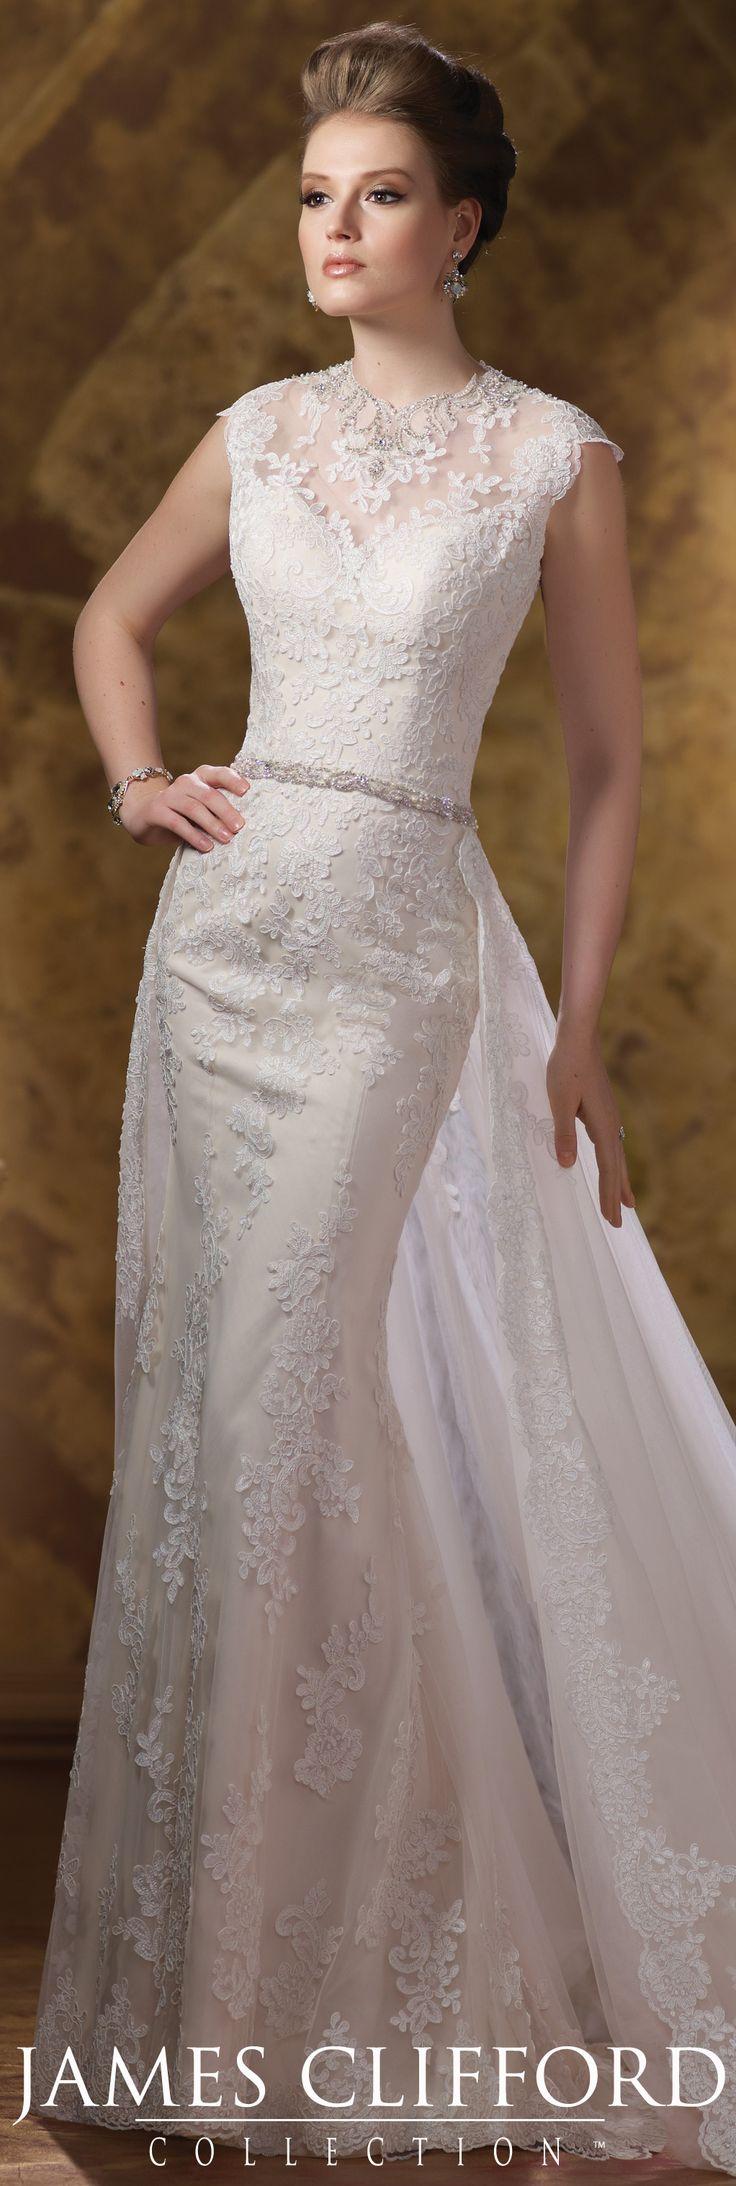 The James Clifford Fall 2015 Wedding Dress Collection - Style No. J21502 #laceweddingdress